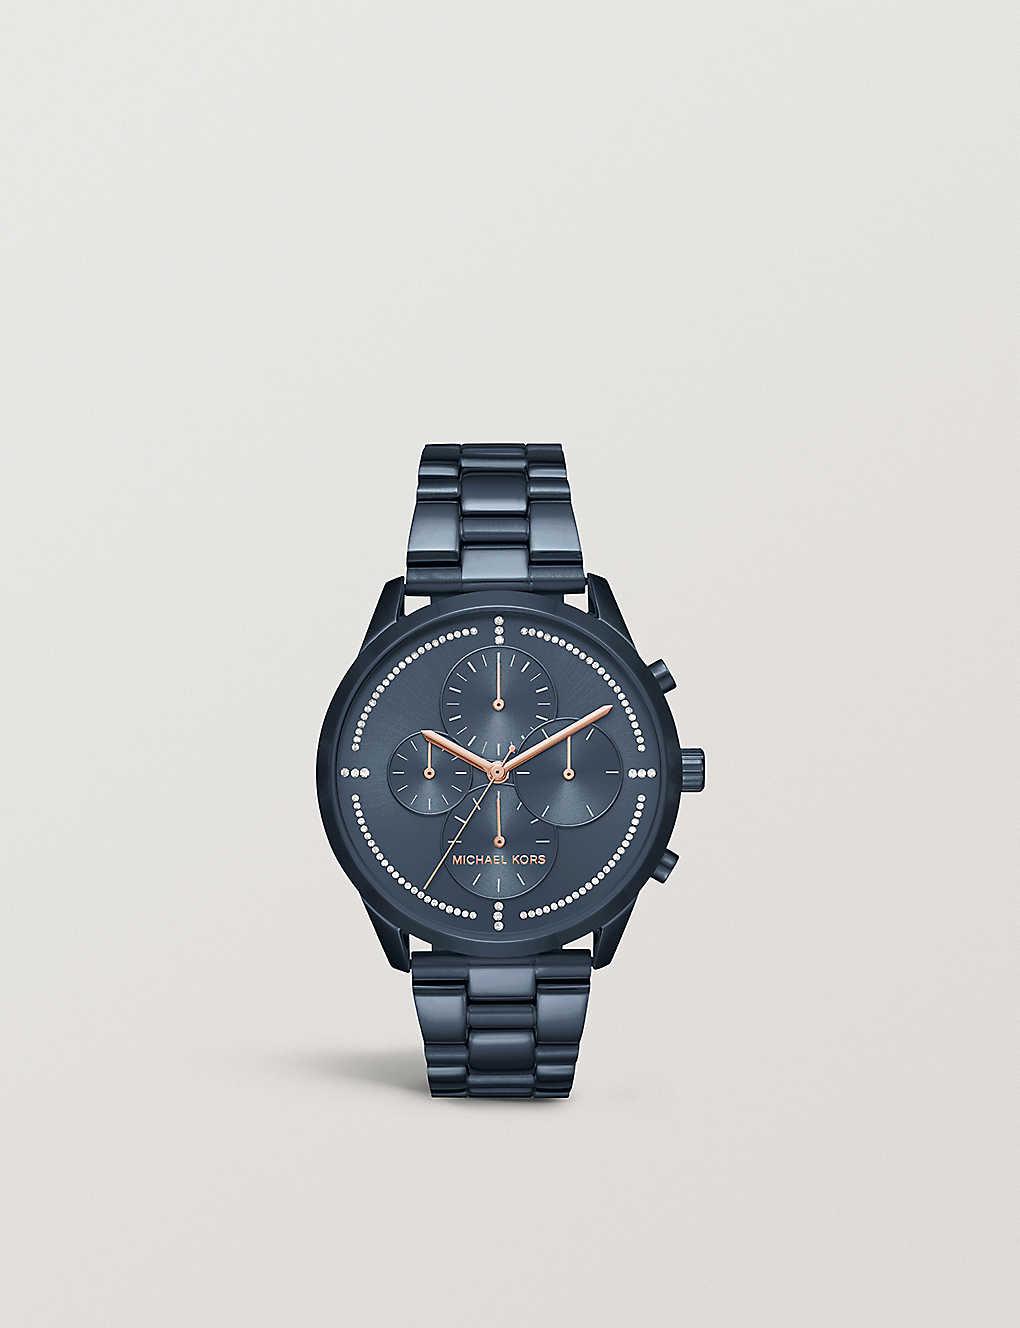 e8eca1cc799b MICHAEL KORS - MK6522 Slater blue stainless steel bracelet chronograph watch